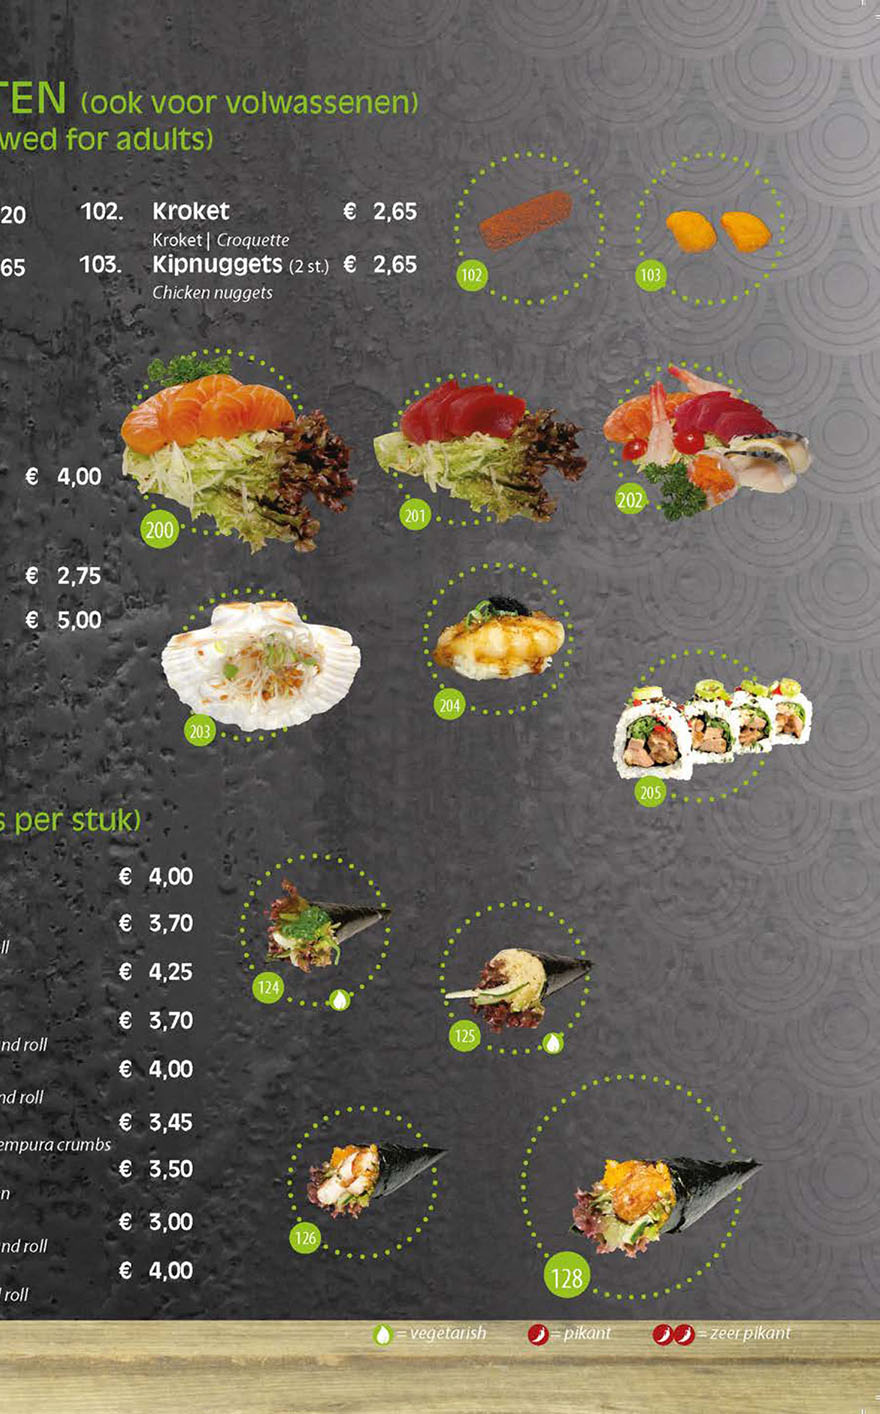 Chinees Houten T Rond.Chinees Sushi Restaurant Ming Ming Houten Kom Gezellig Bij Ons